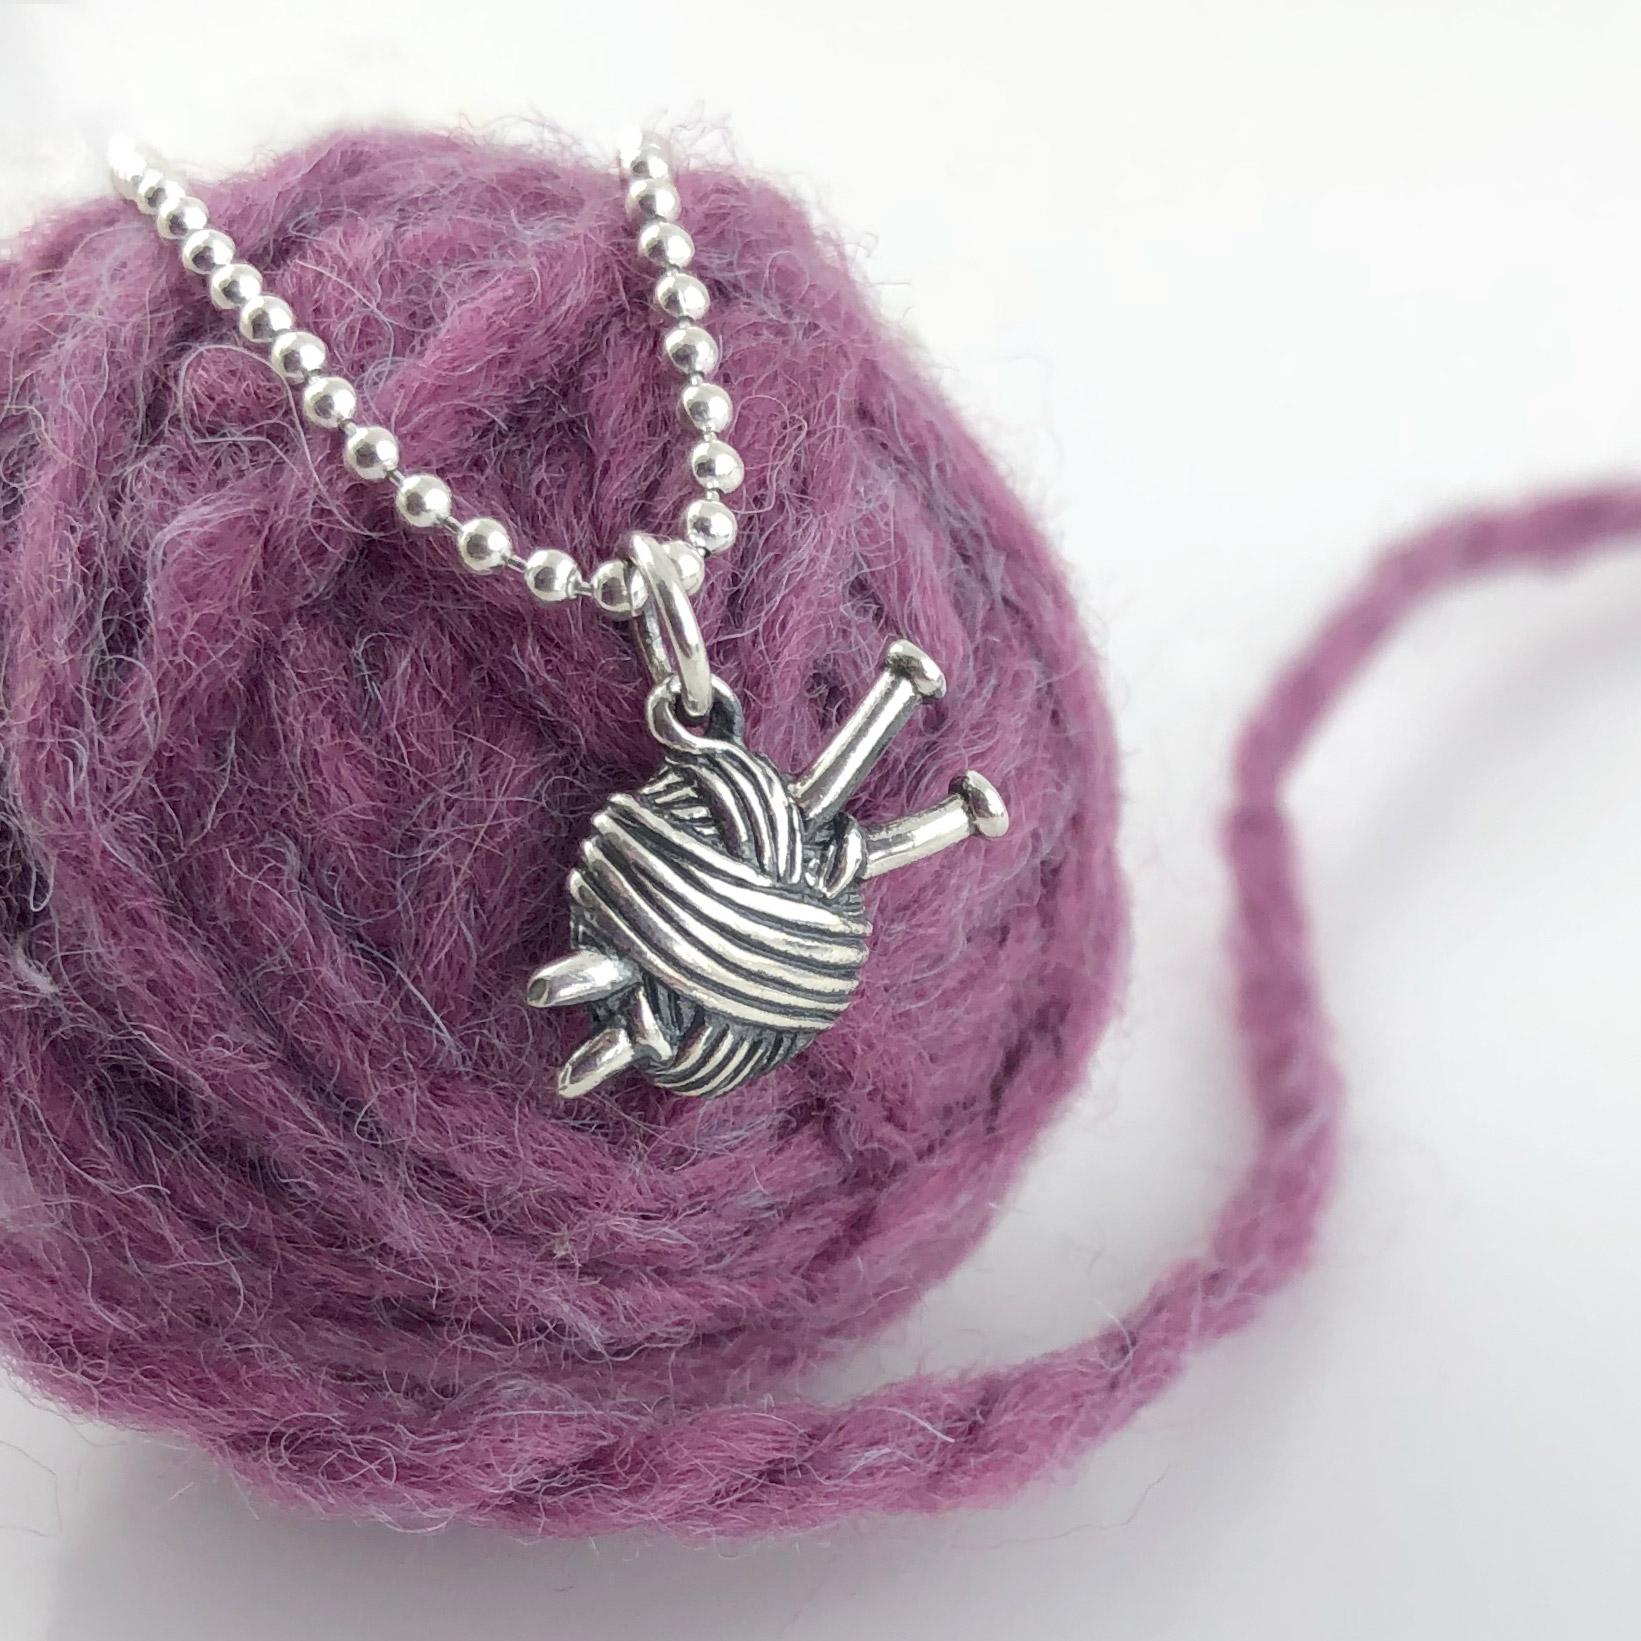 Knitting Needles / Yarn Ball Necklace